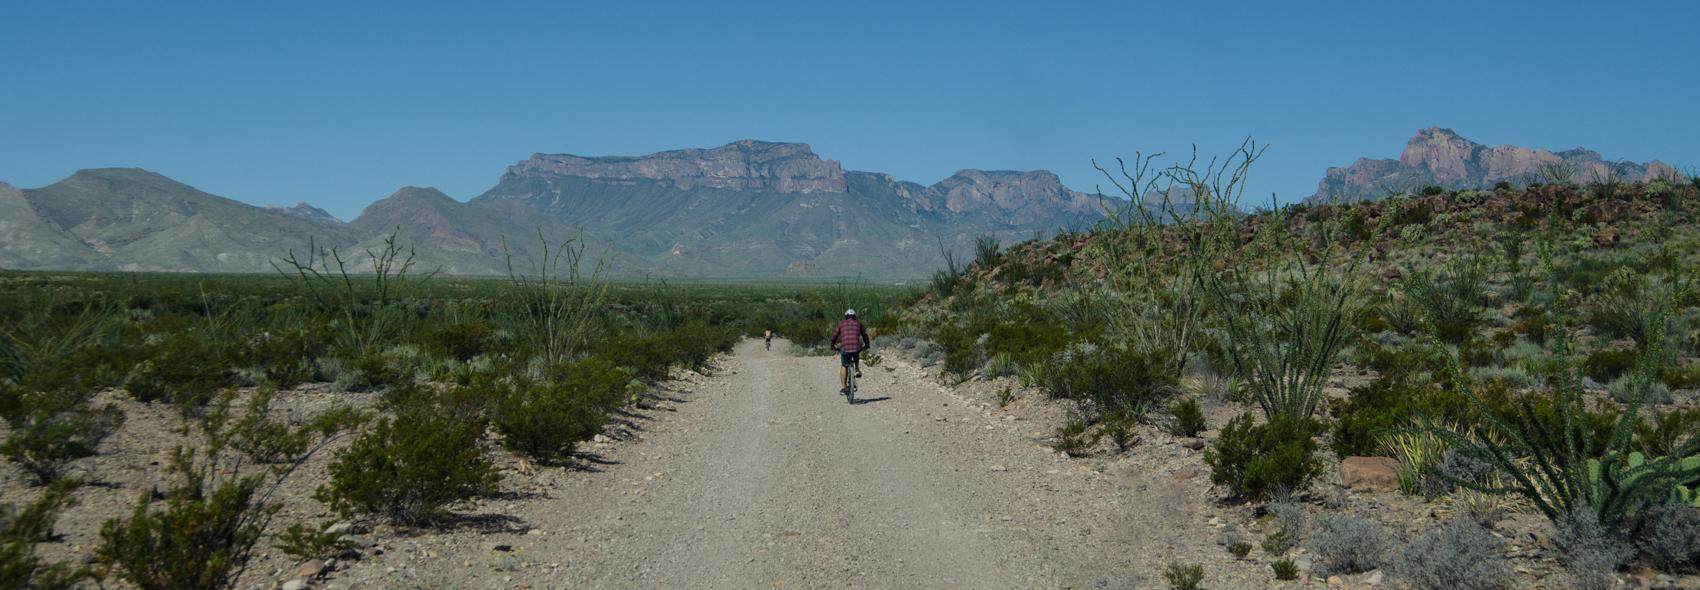 Mountain biking in big bend national park-leh cycling goods-1.jpg